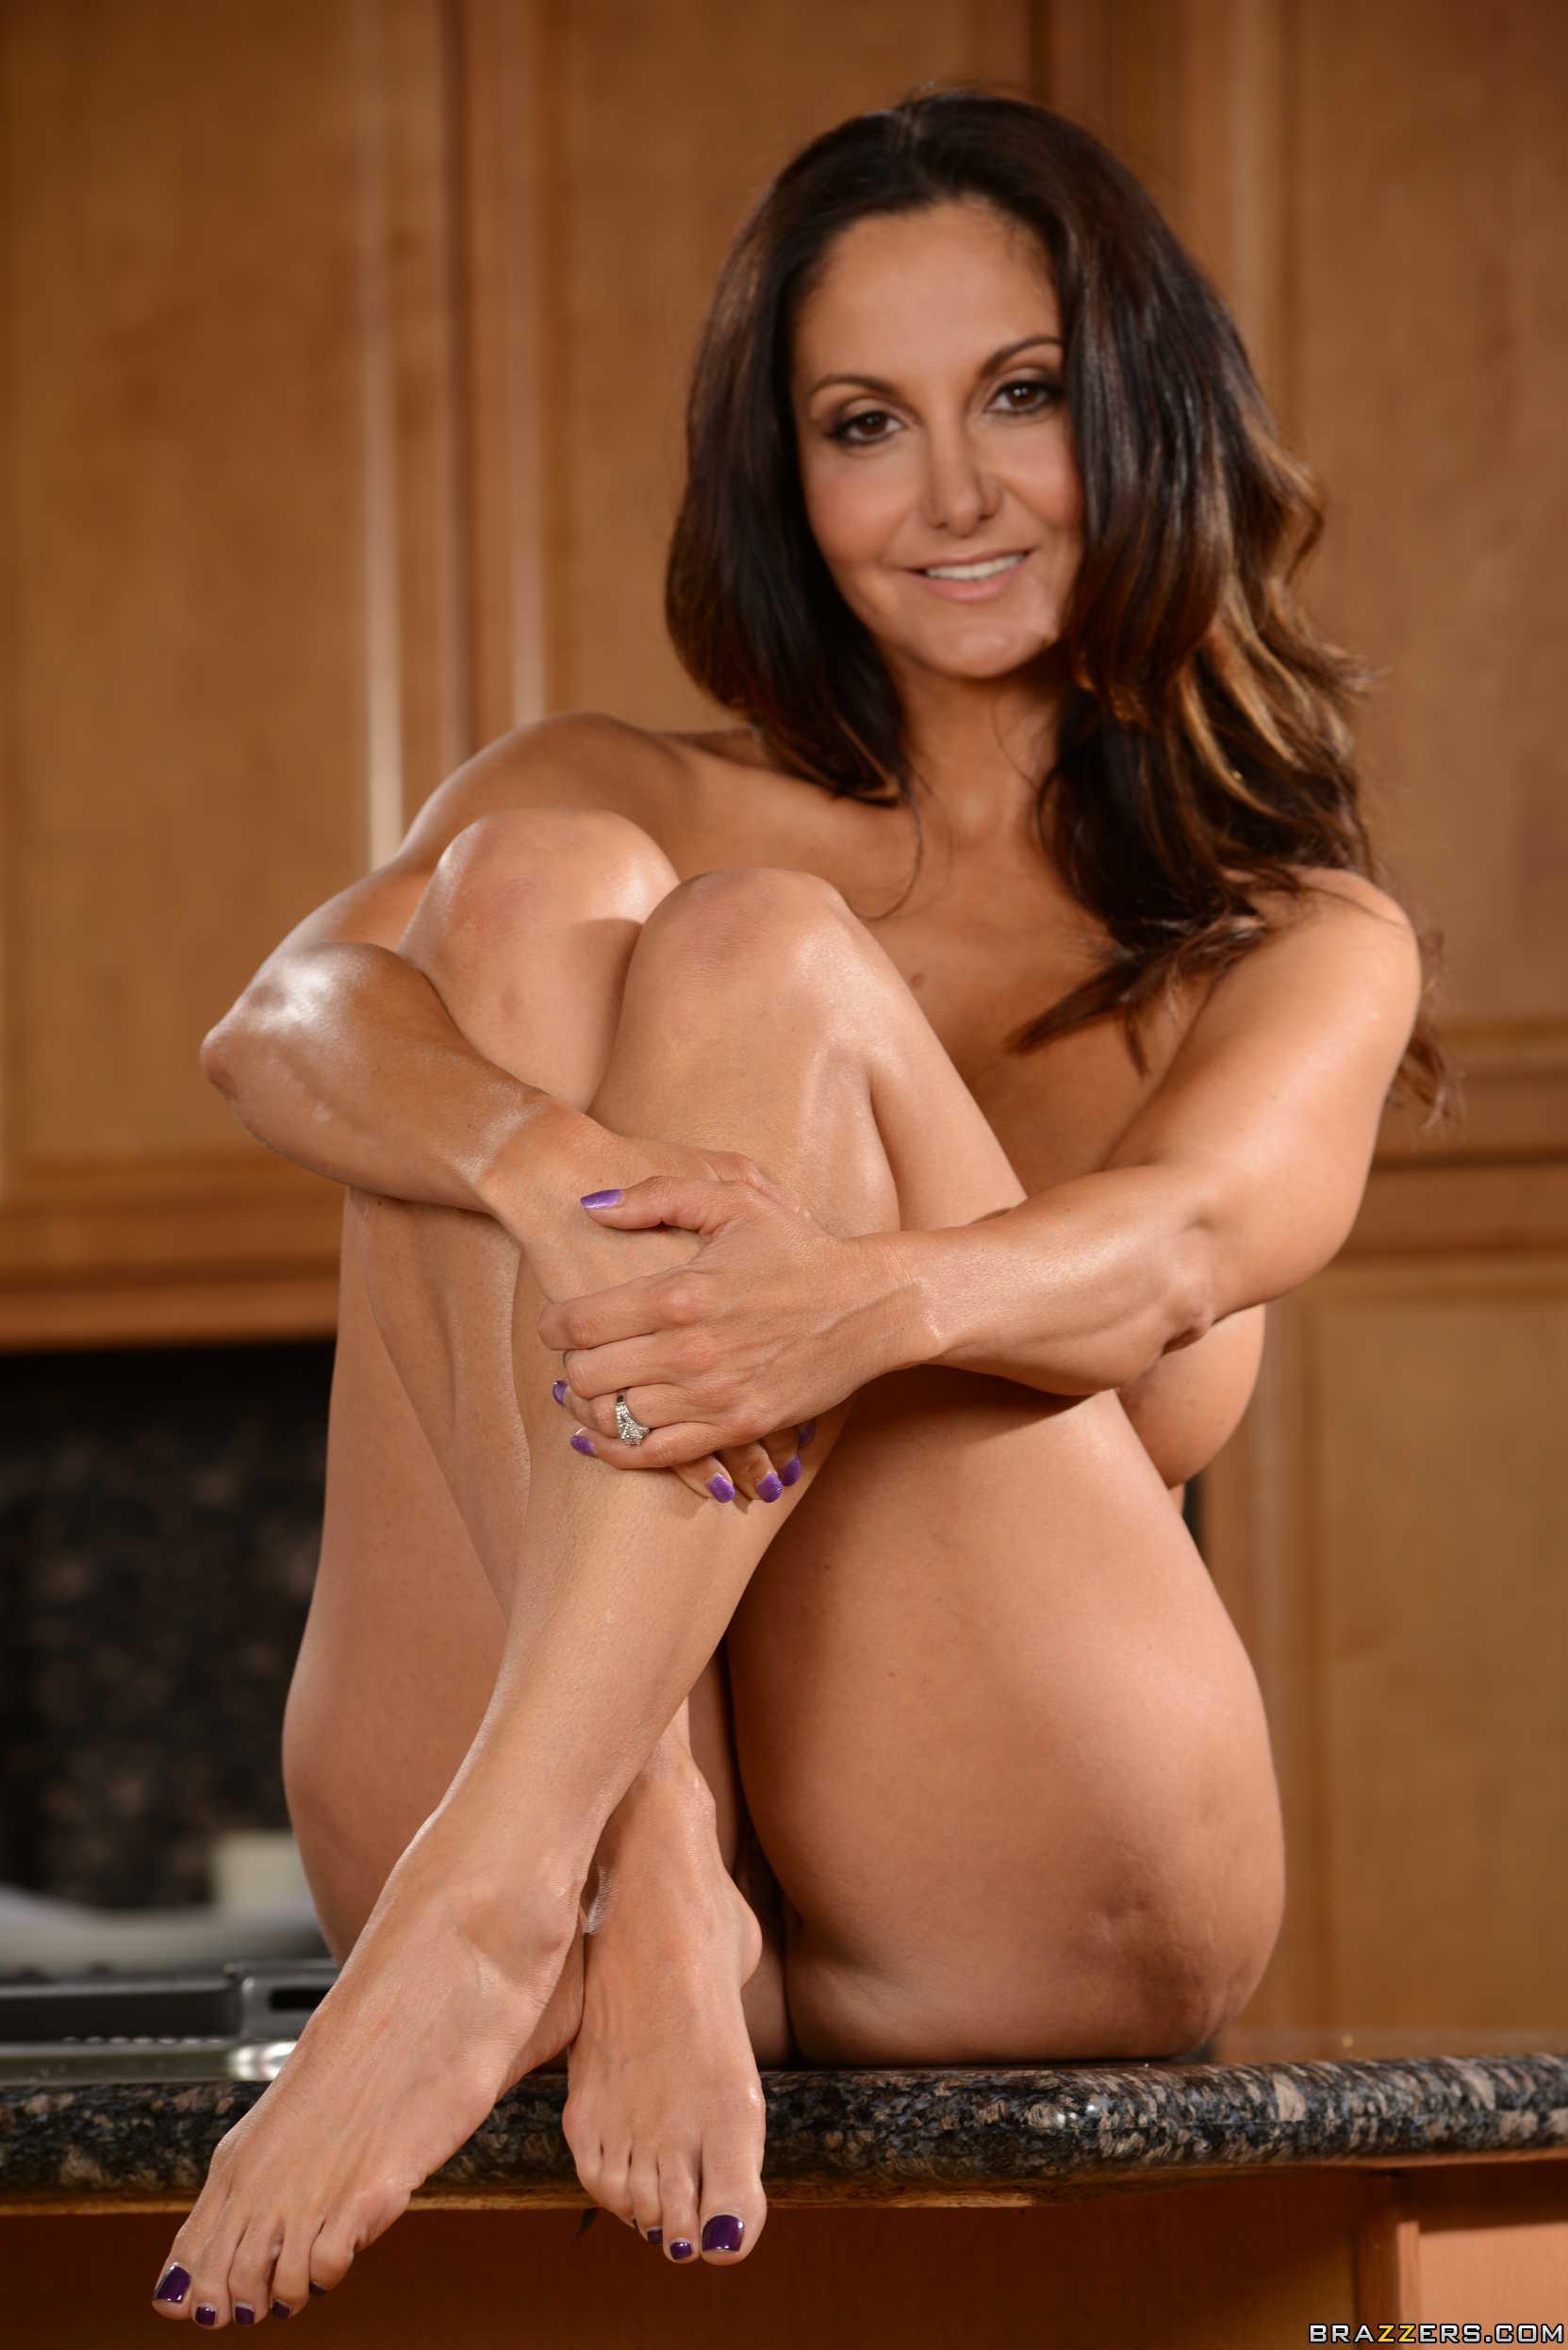 Ava addams muestra su golosa conchita